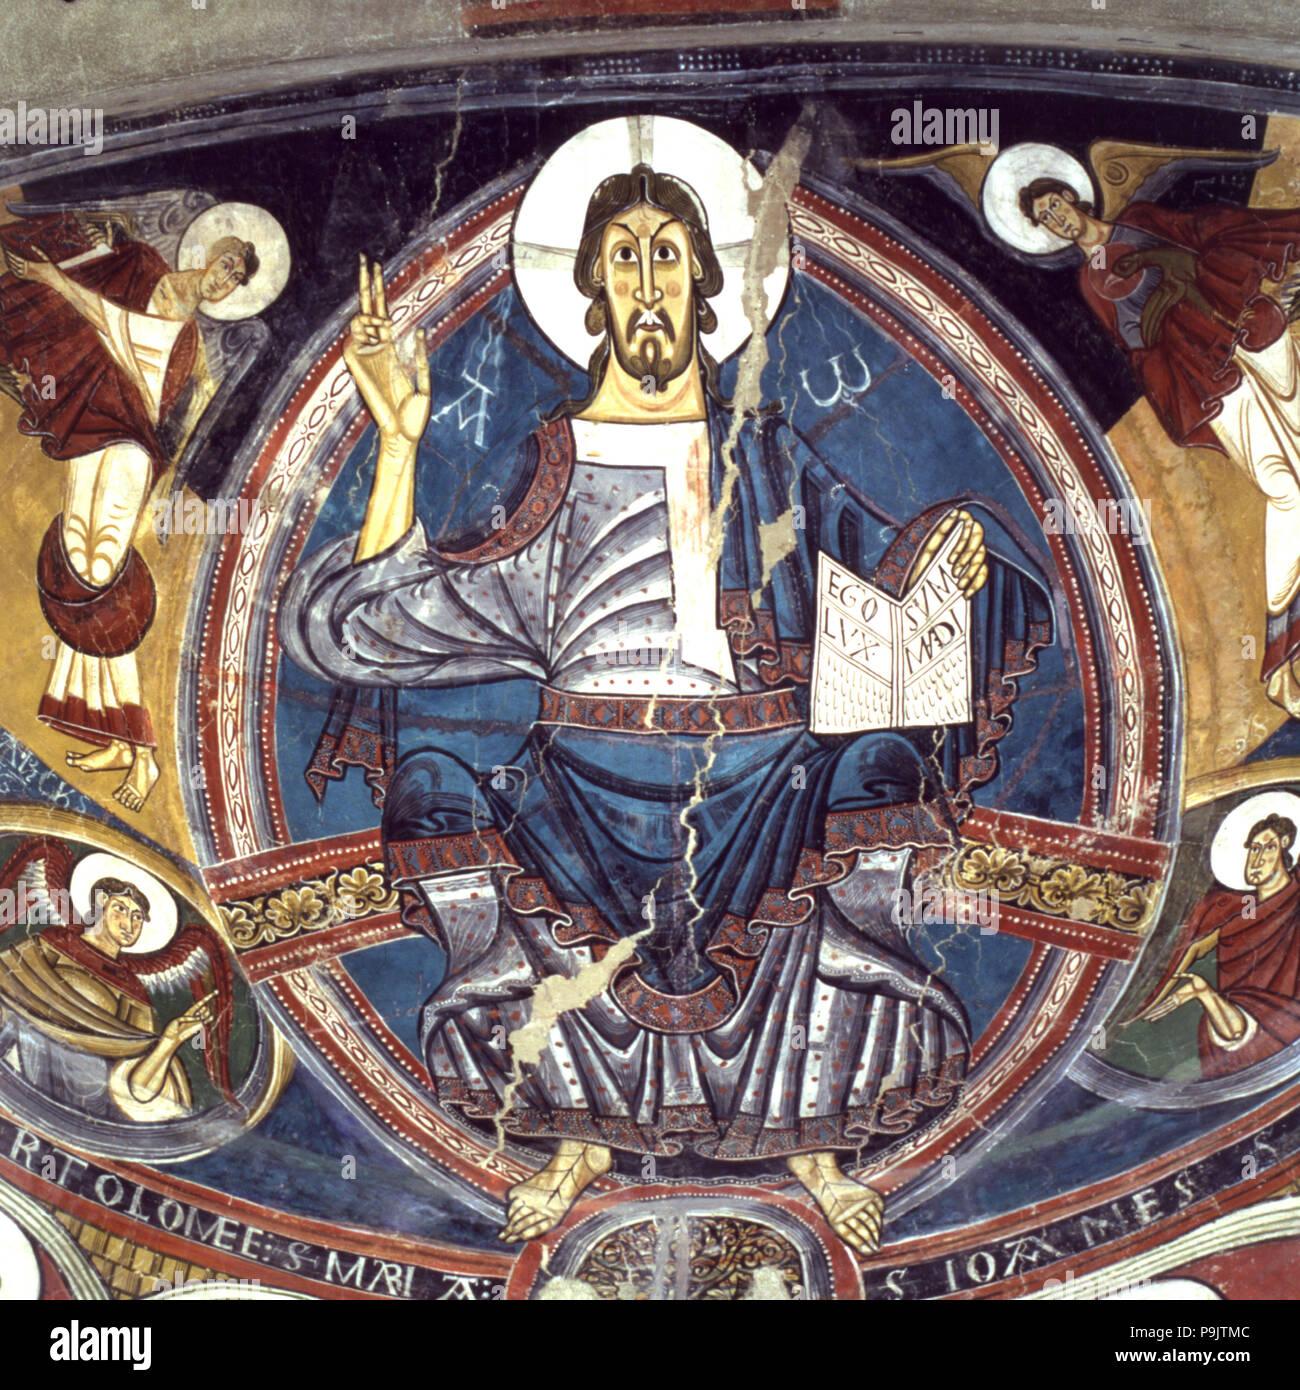 Apse of the church of Sant Climent de Taüll in Vall de Boi (Boi Valley), Alta Ribagorza. - Stock Image